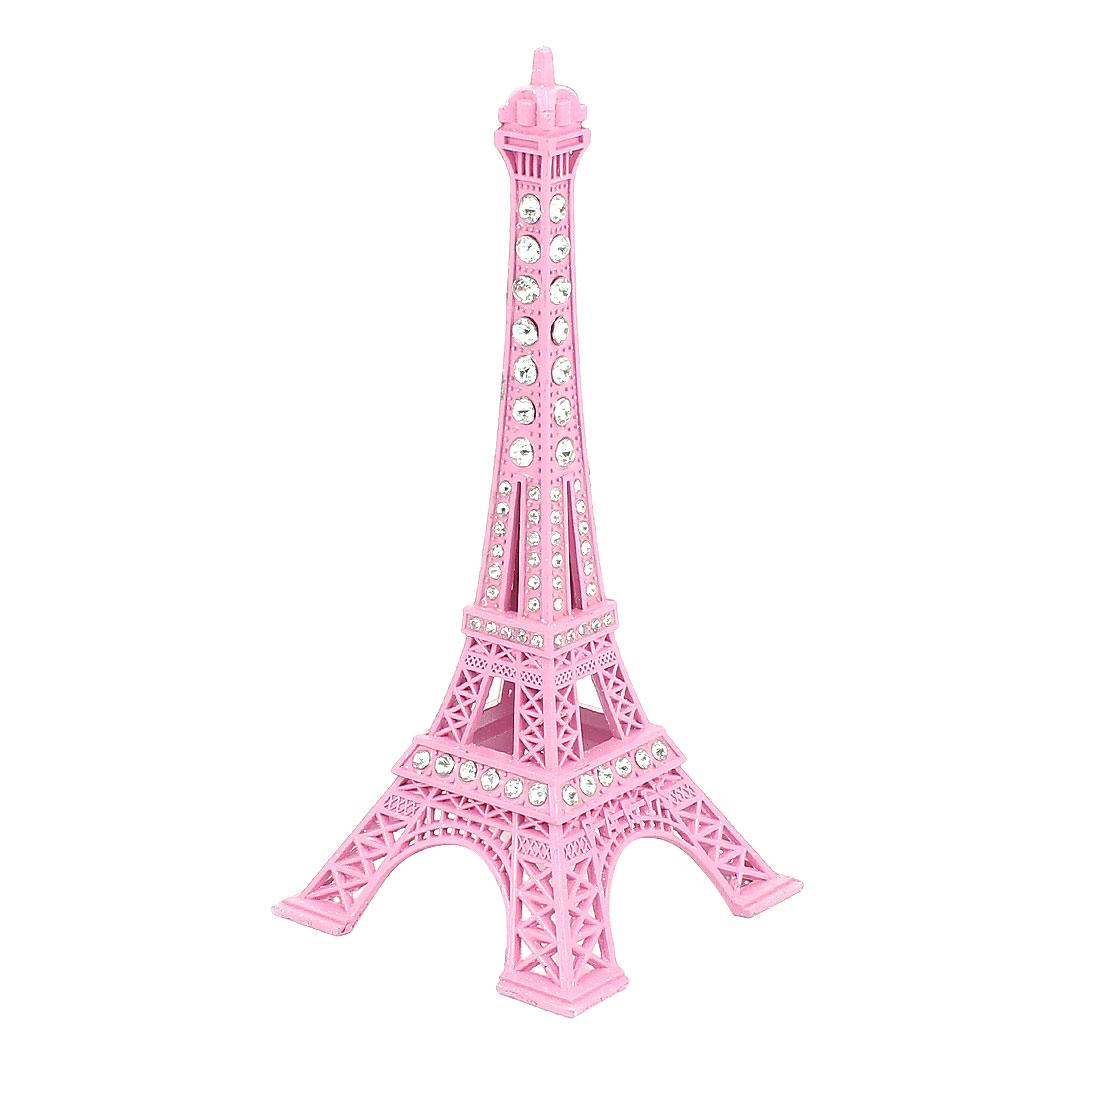 "Rhinestone Decor Mini France Paris Eiffel Tower Statue Vintage Model Ornament 5"" 13cm Height Pink"